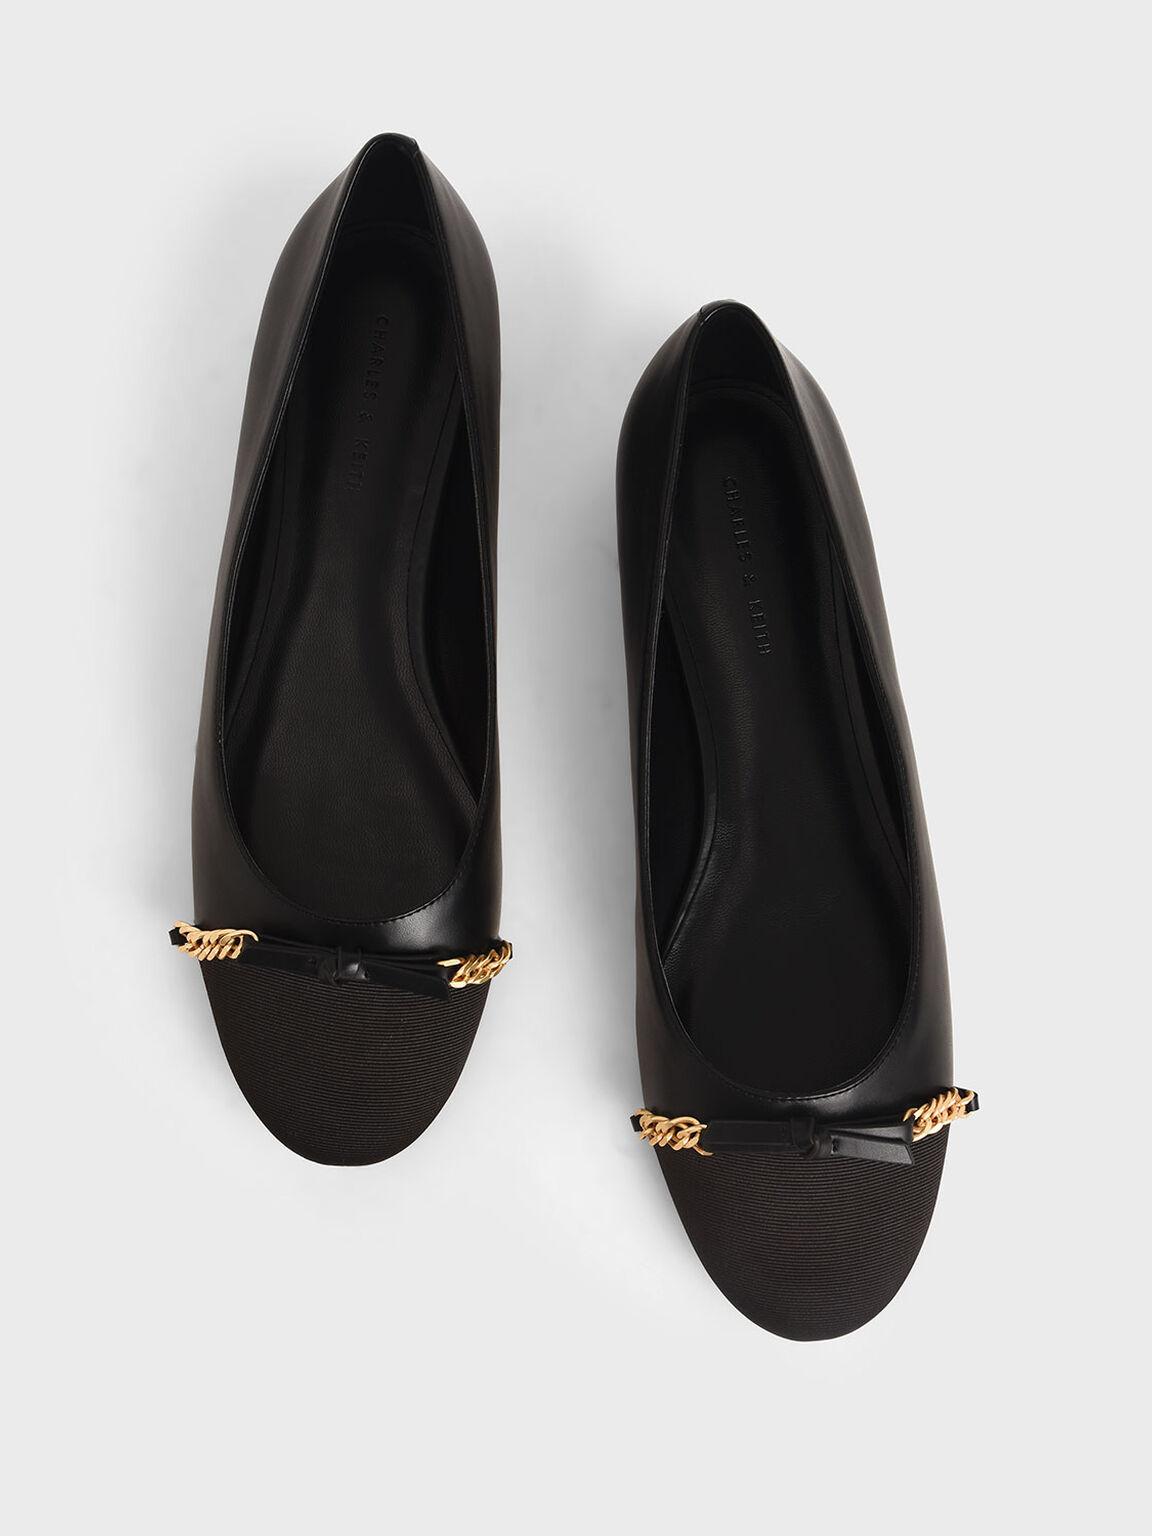 Grosgrain Chain-Link Ballerina Flats, Black, hi-res